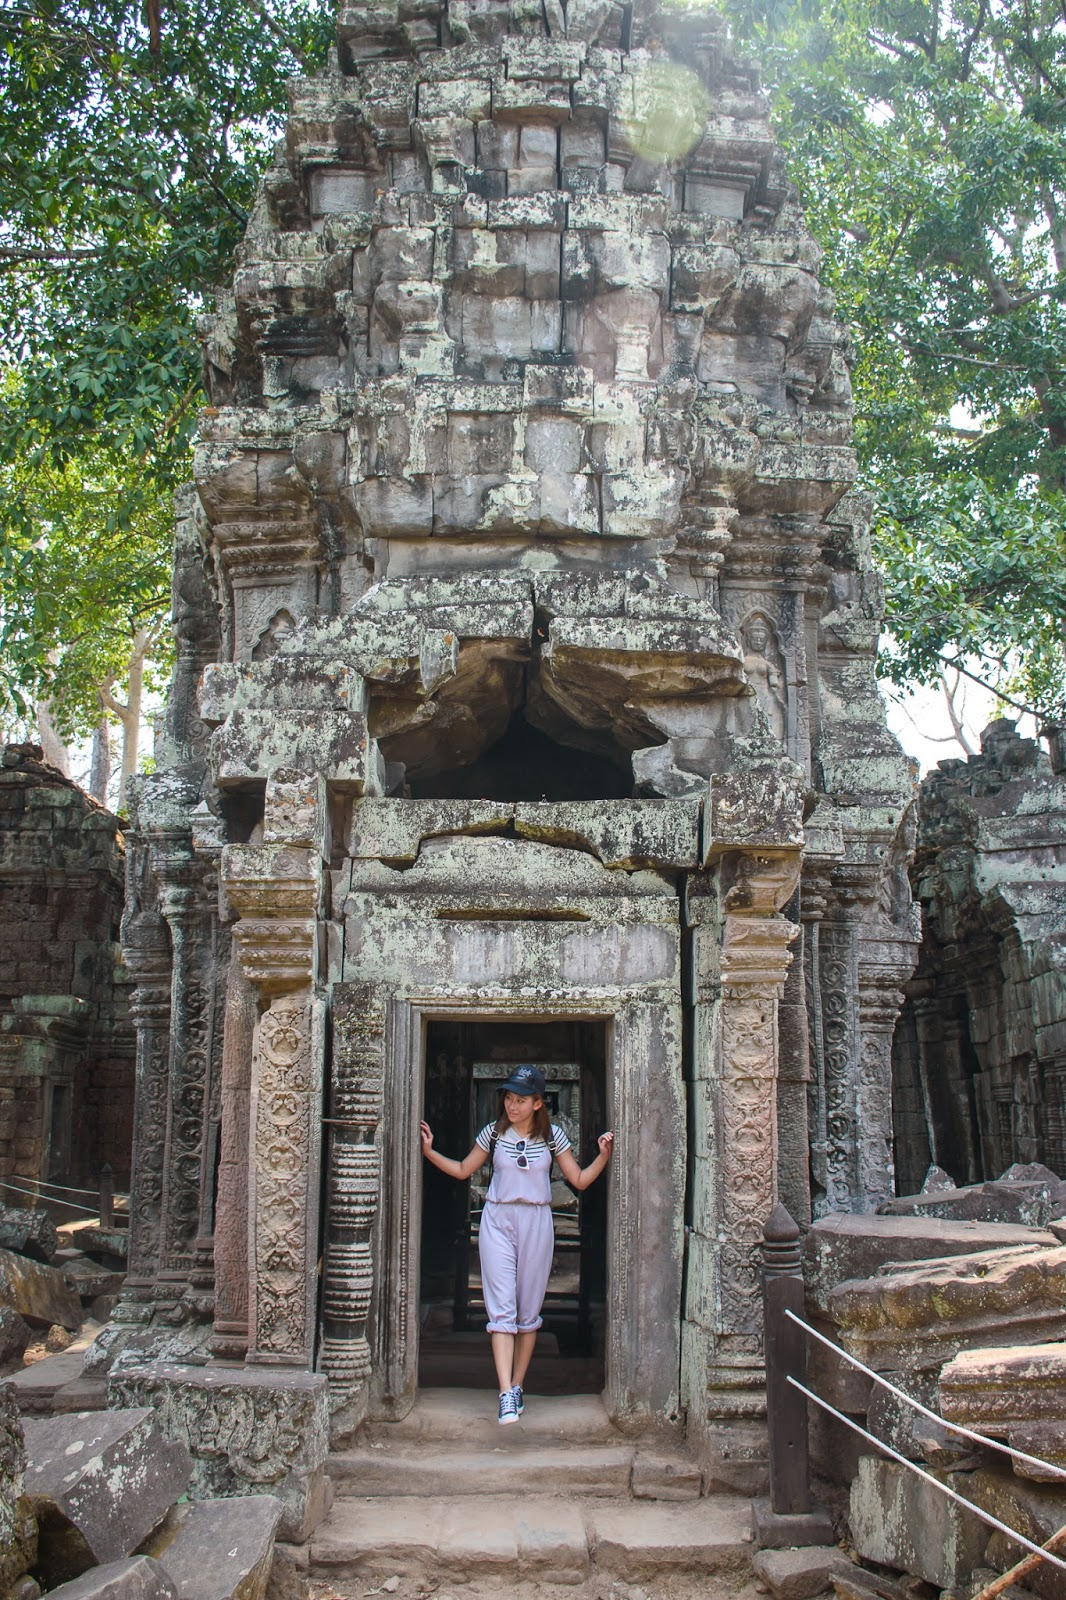 cambodia siem reap bayan temple image